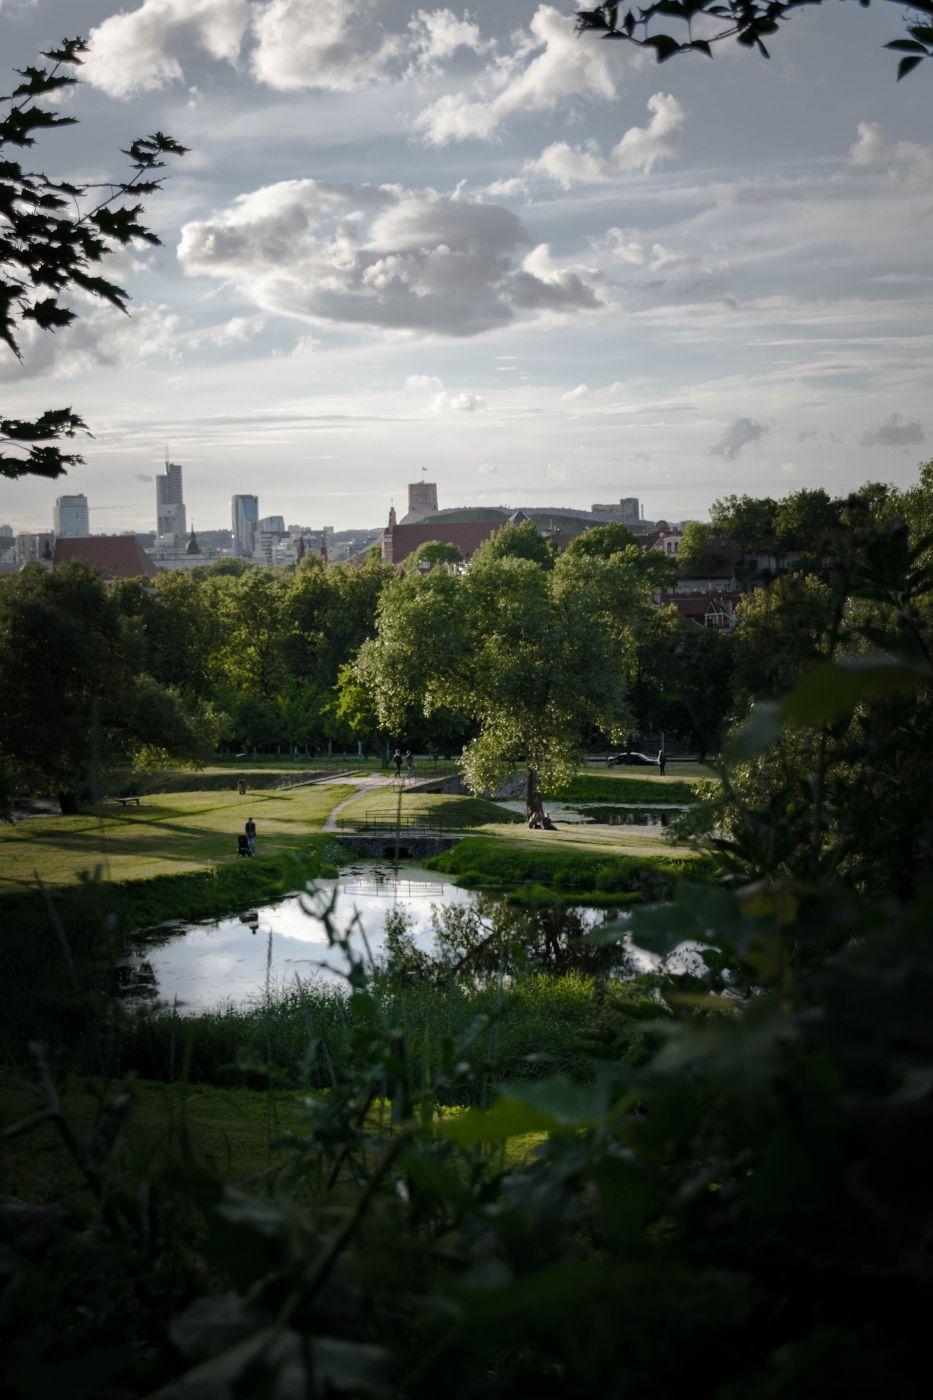 Kūdrų Park, Vilnius, Lithuania